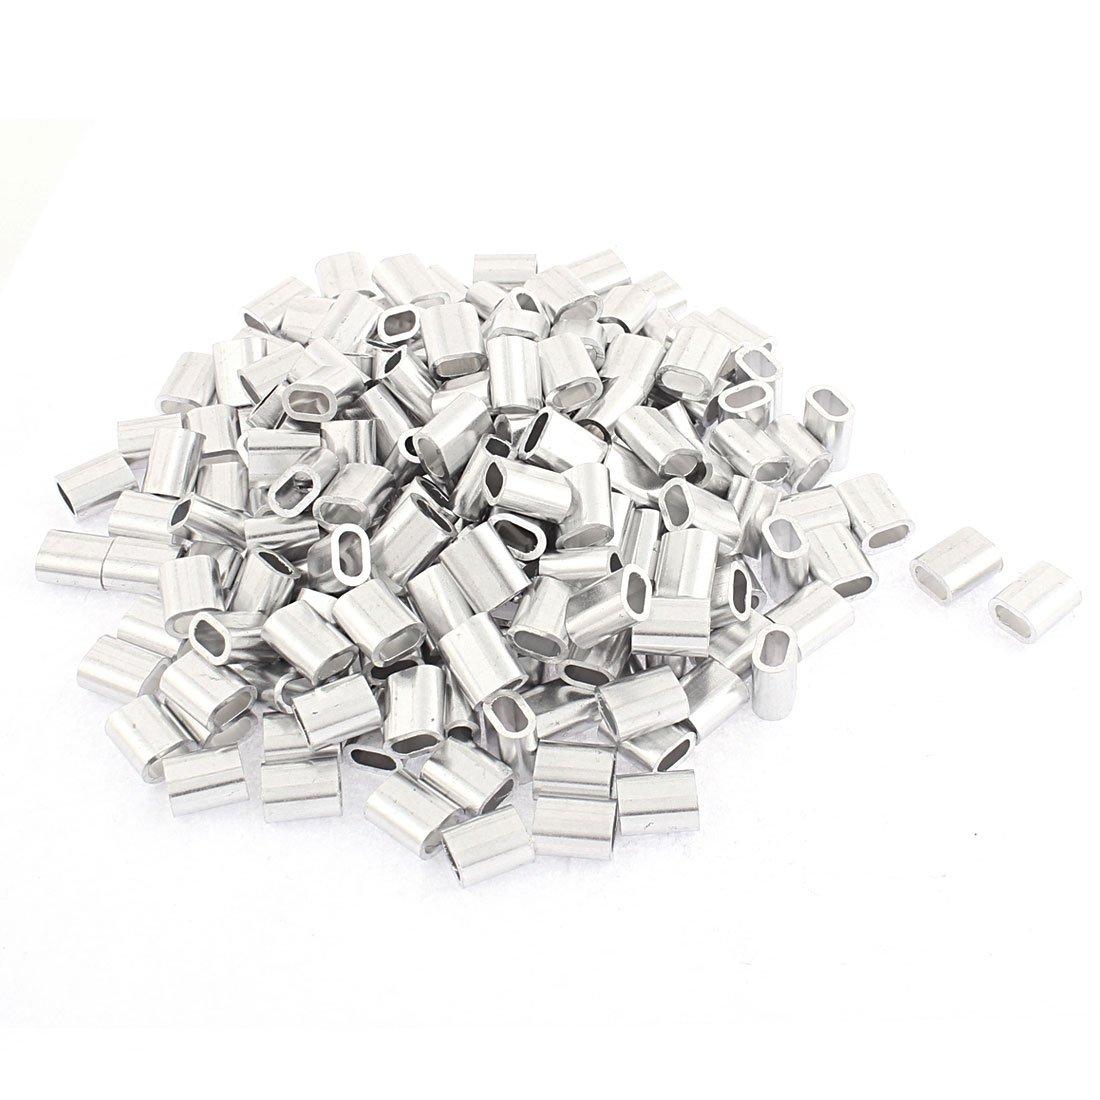 uxcell 4mm Steel Wire Rope Aluminum Ferrules Sleeves Fittings Loop 200 Pcs